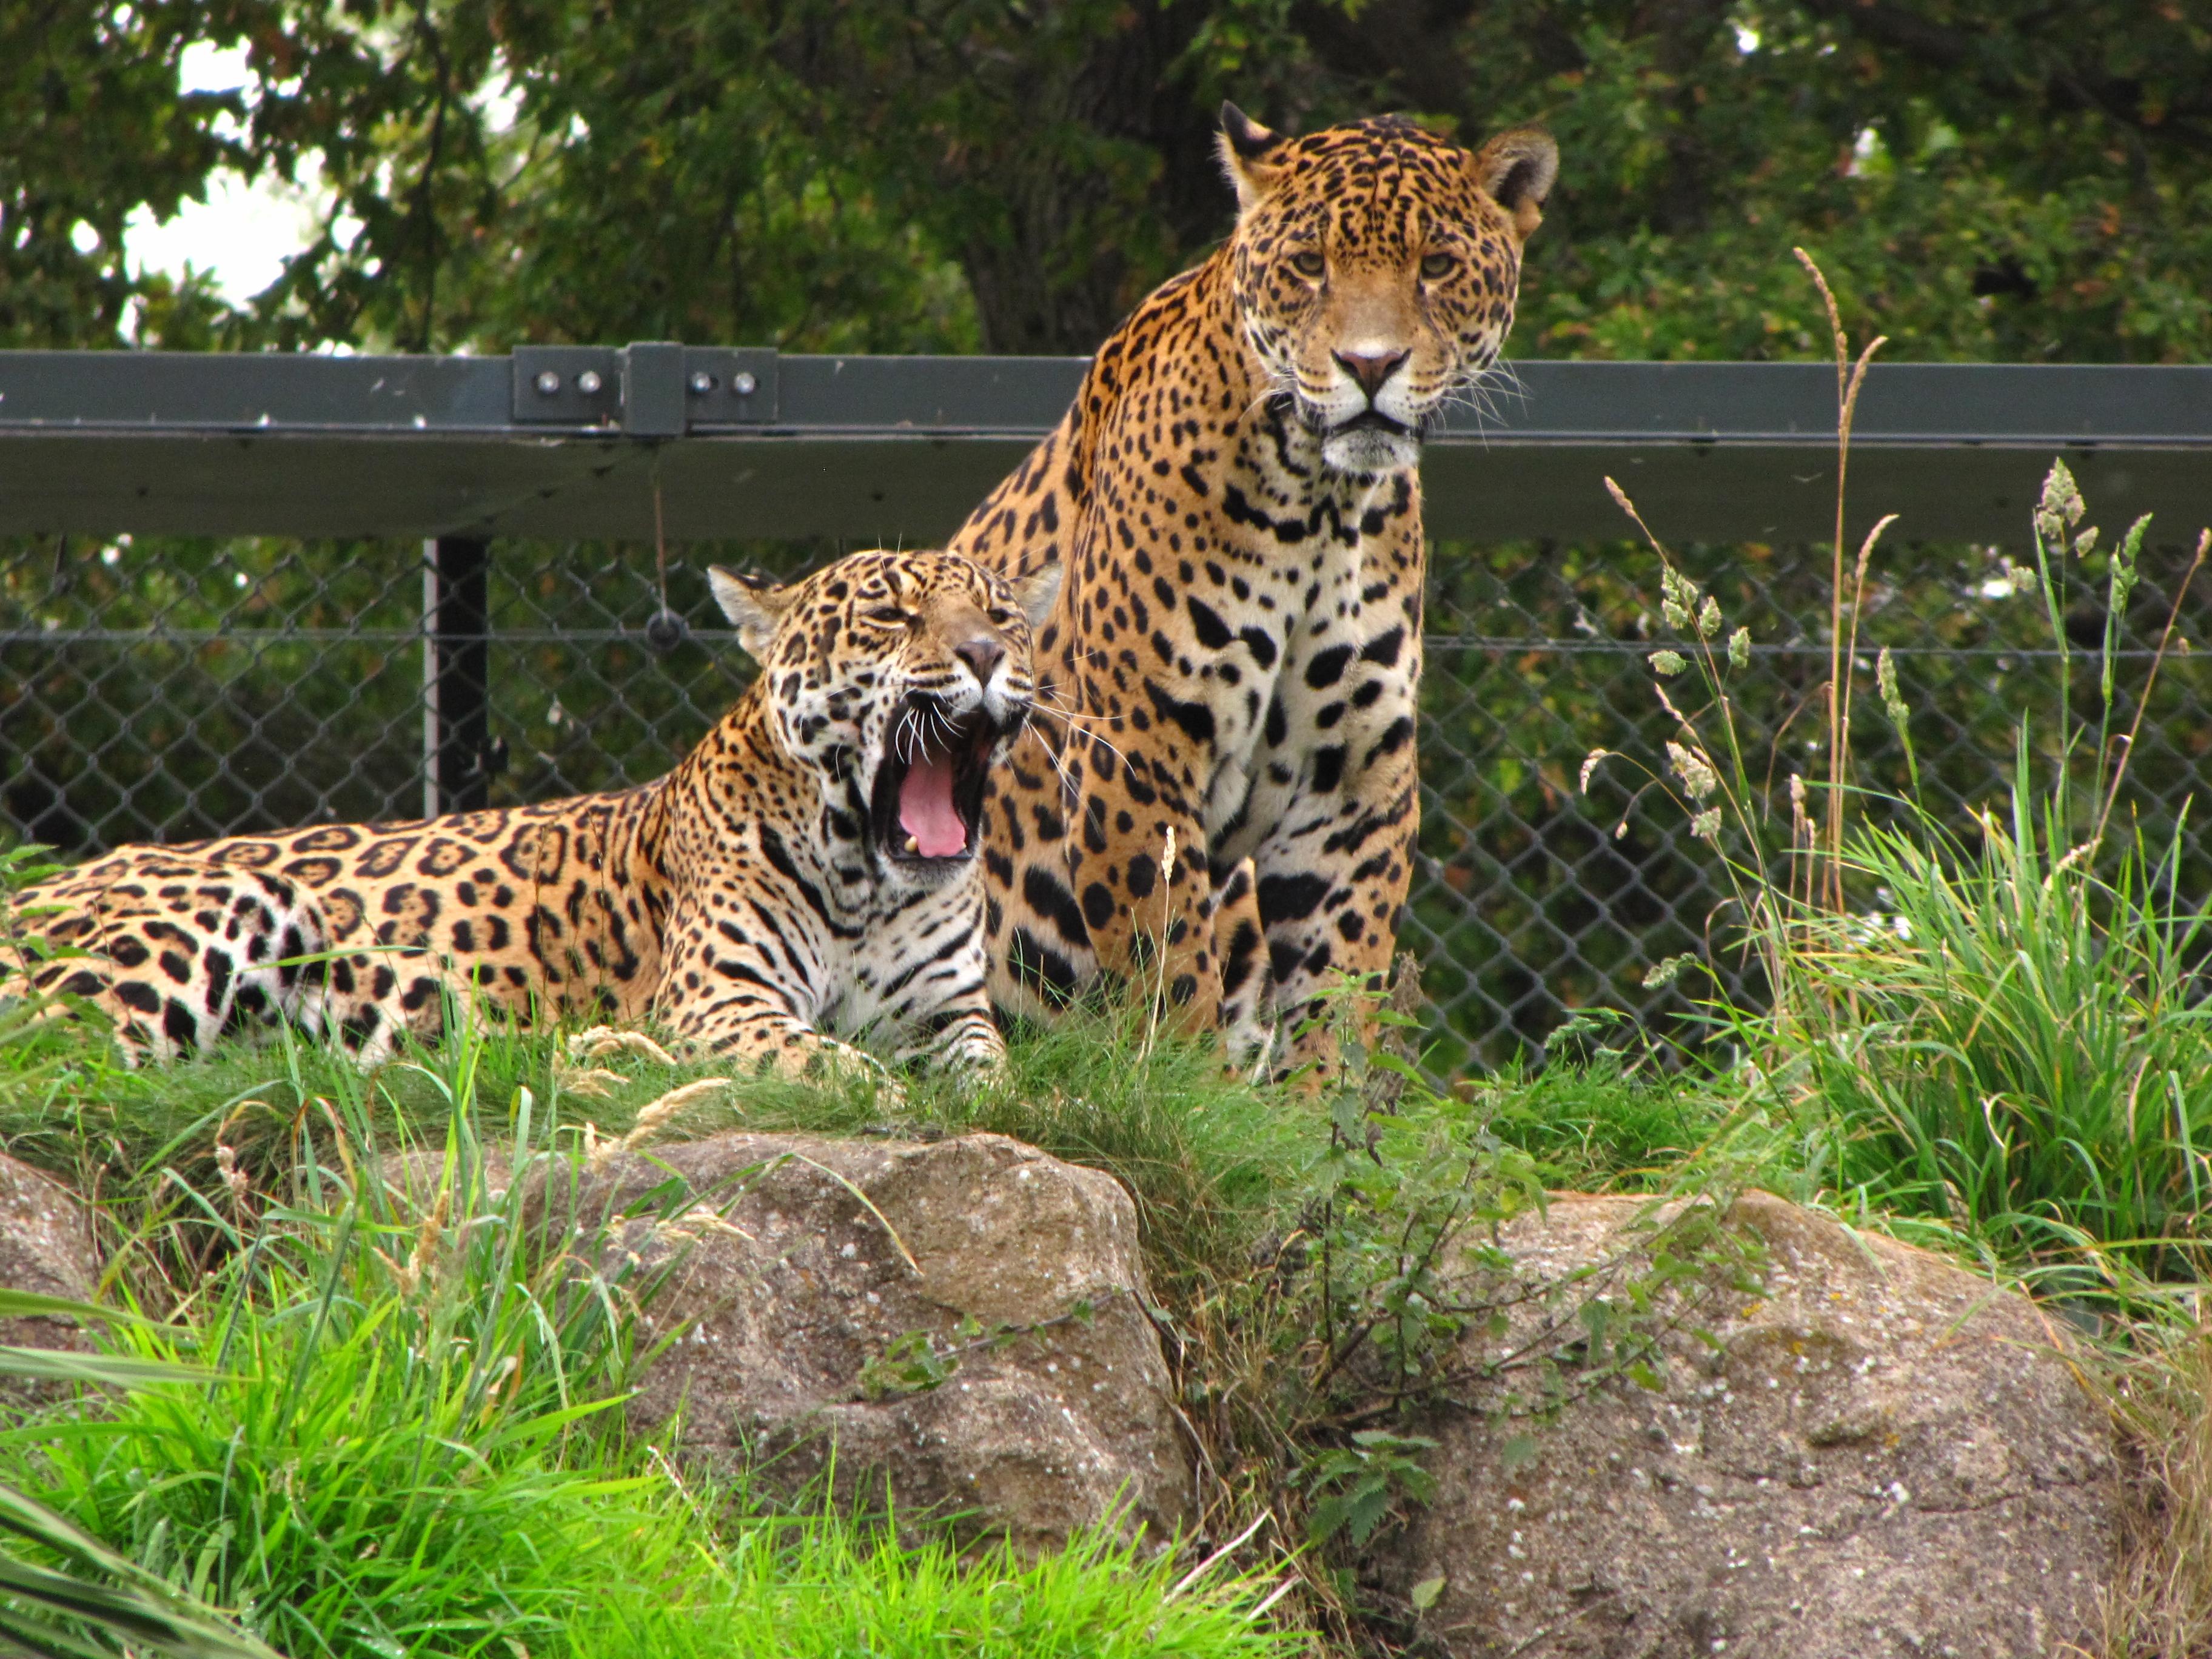 حديقة الحيوانات تشيستر Chester Zoo